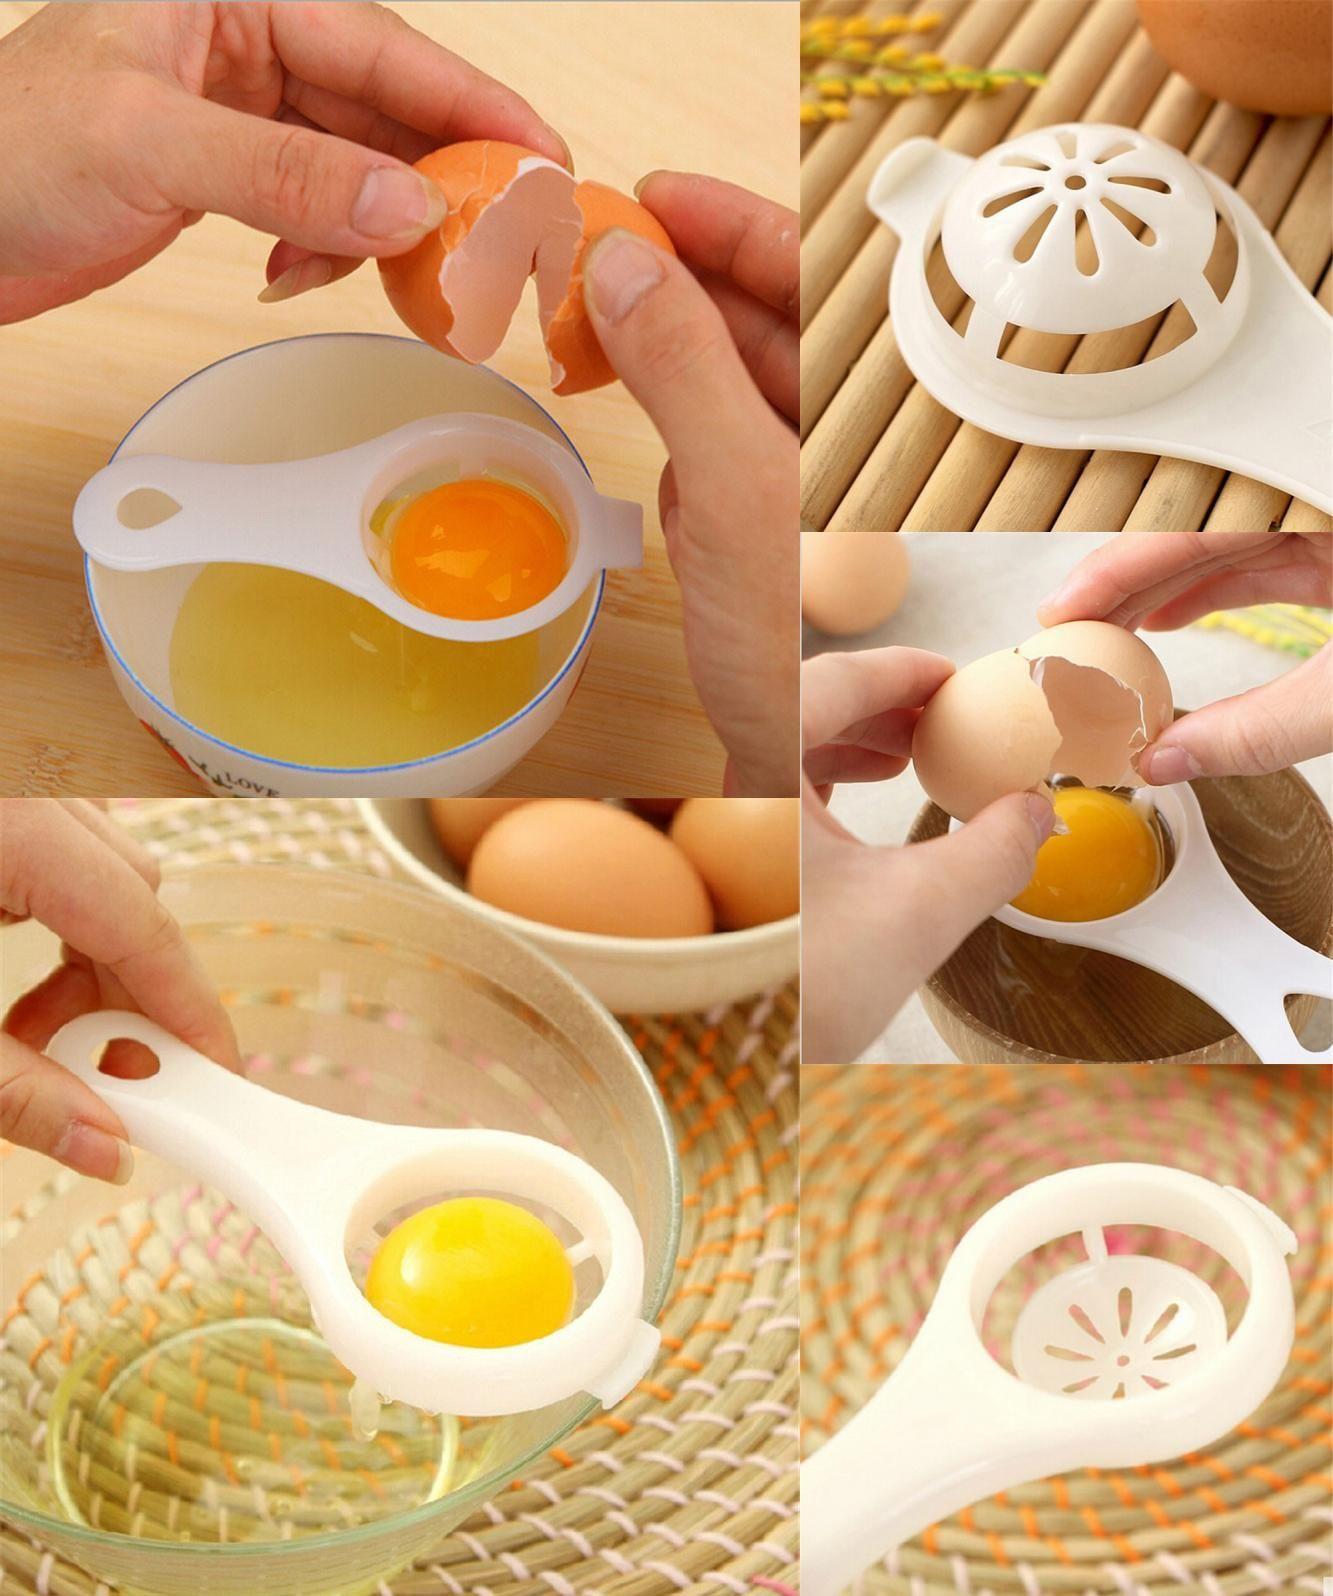 [Visit to Buy] Hot sale Eco Friendly Transparent Egg Yolk Separator Egg Divider  Hand Egg Tools pp Food Grade Material #Advertisement